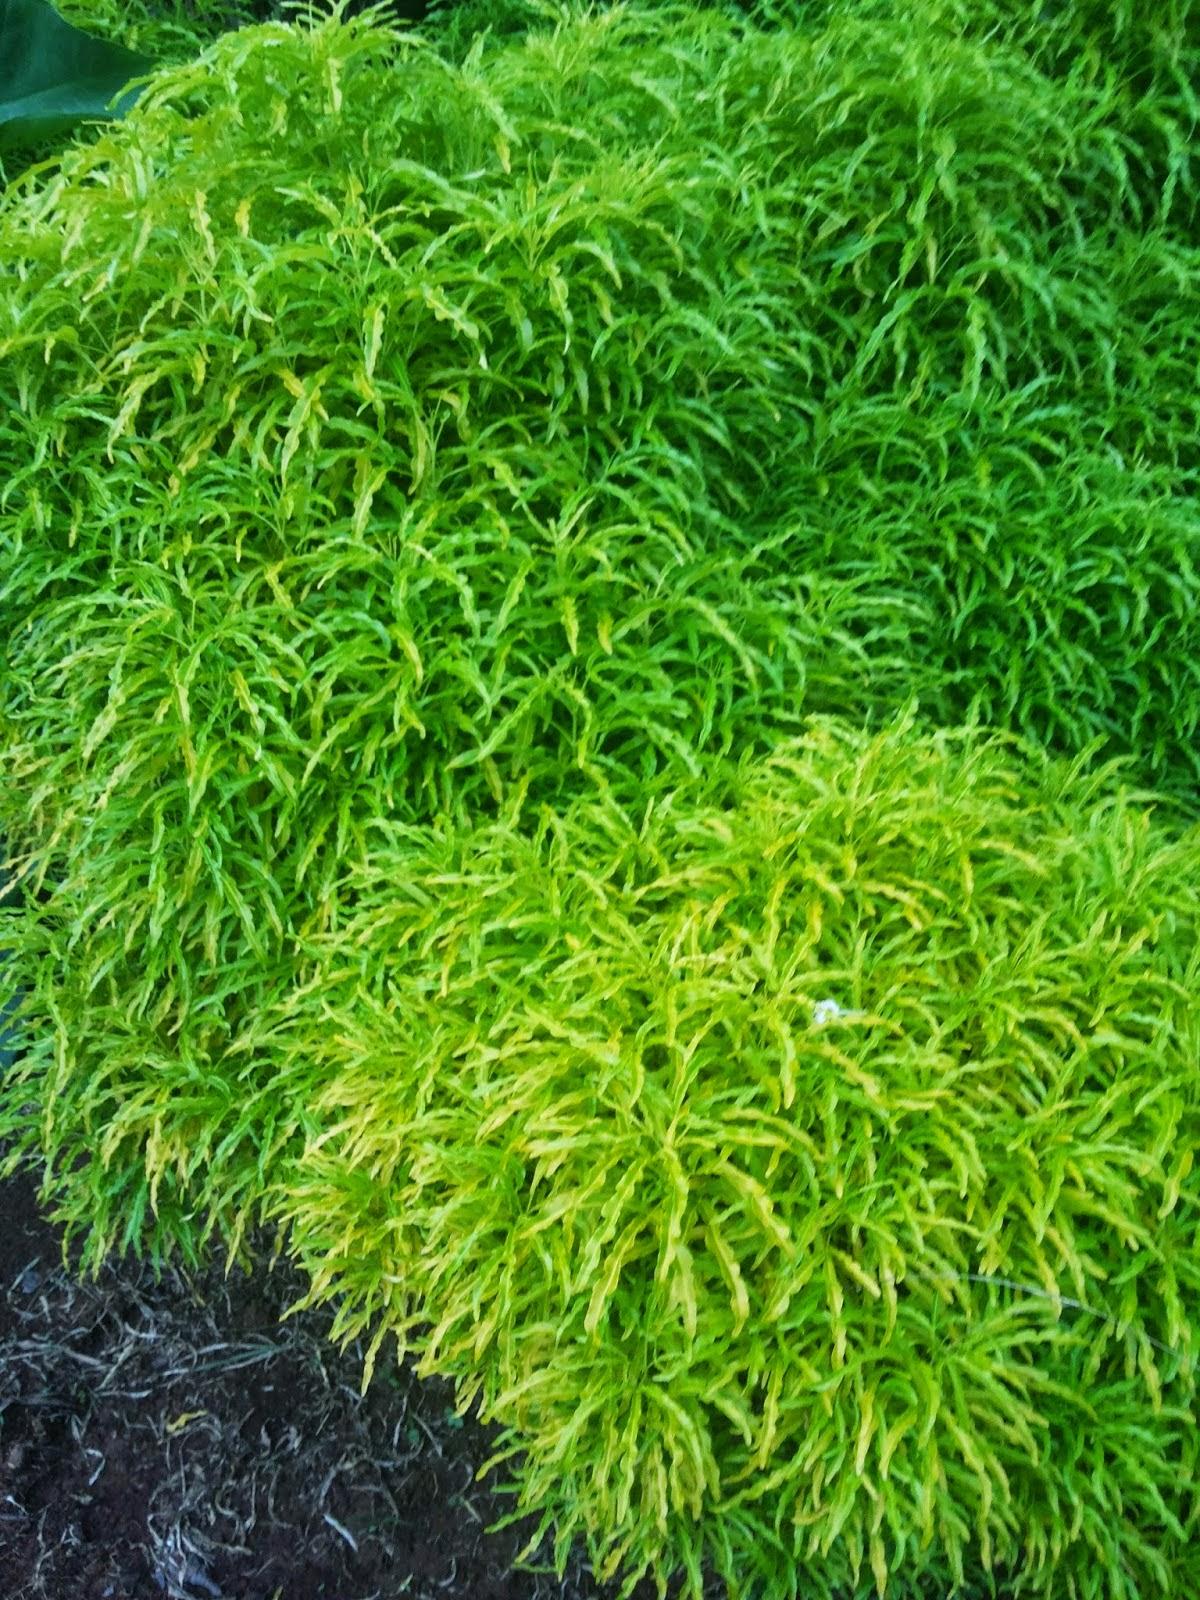 Jual brokoli daun hijau | suplier tanaman | aneka rumput | jasa tukang taman